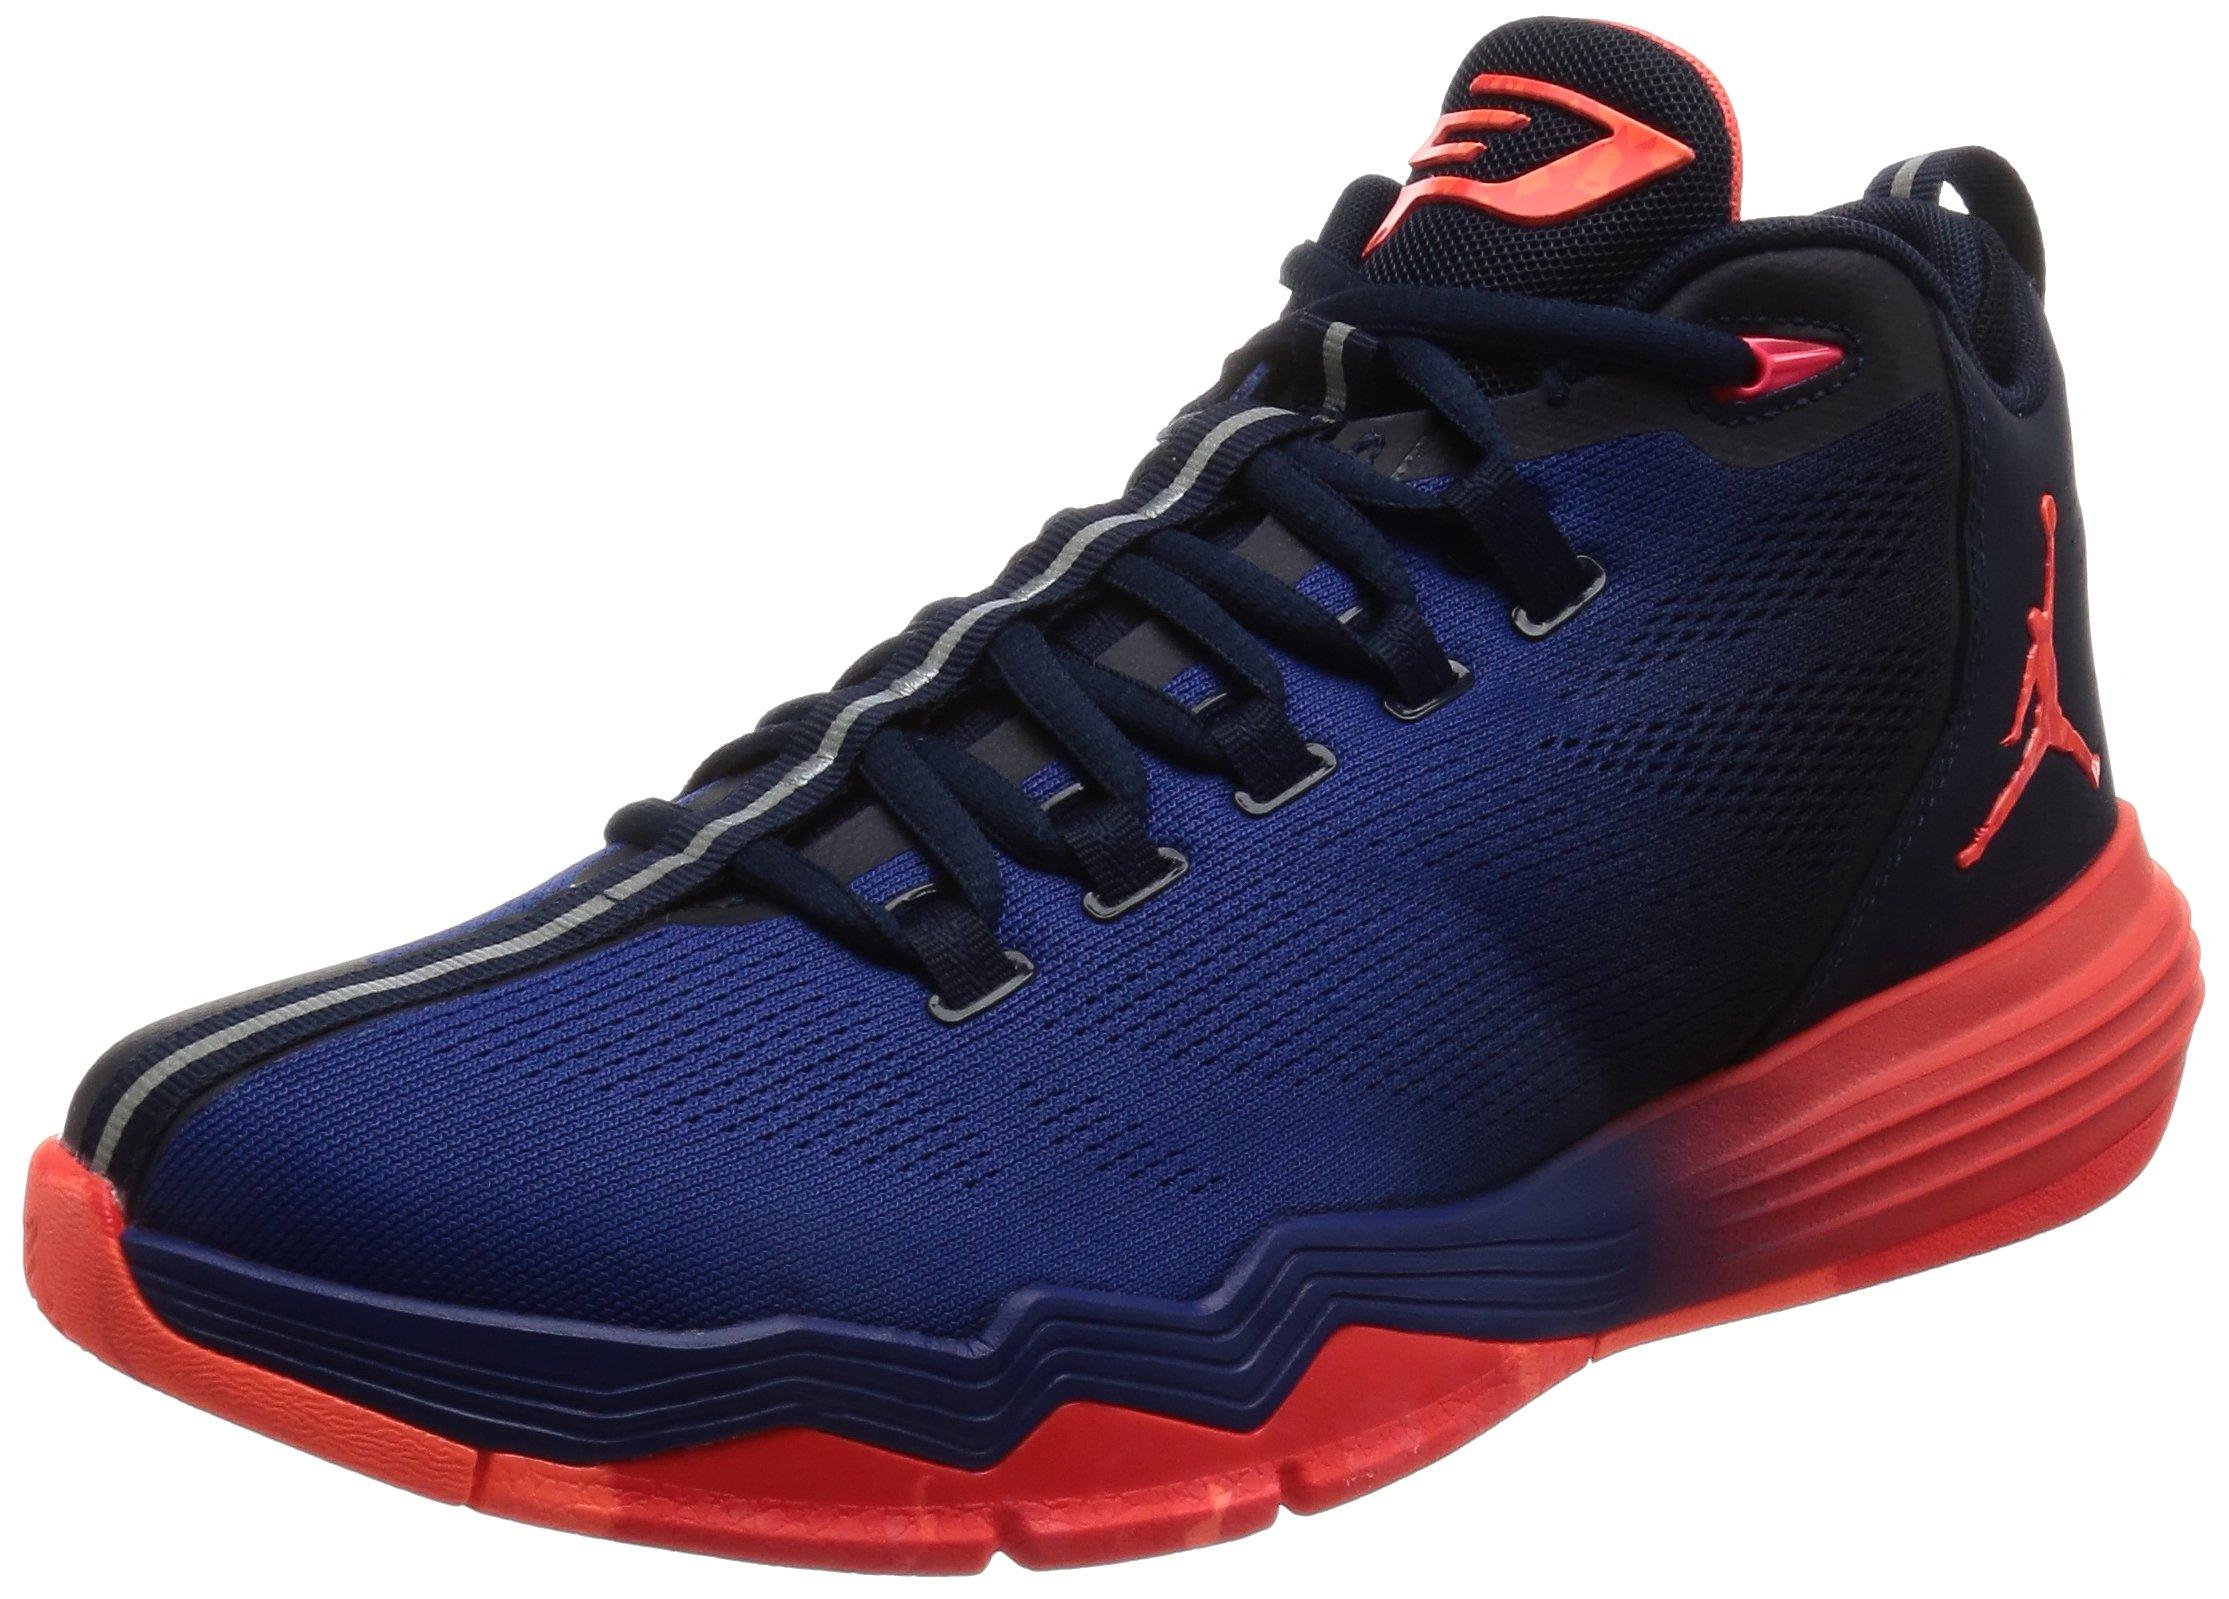 8aa10d14648a Jordan Men Jordan CP3.IX AE Basketball Shoe (navy   obsidian   infrared  23-deep royal blue) Size 10 US